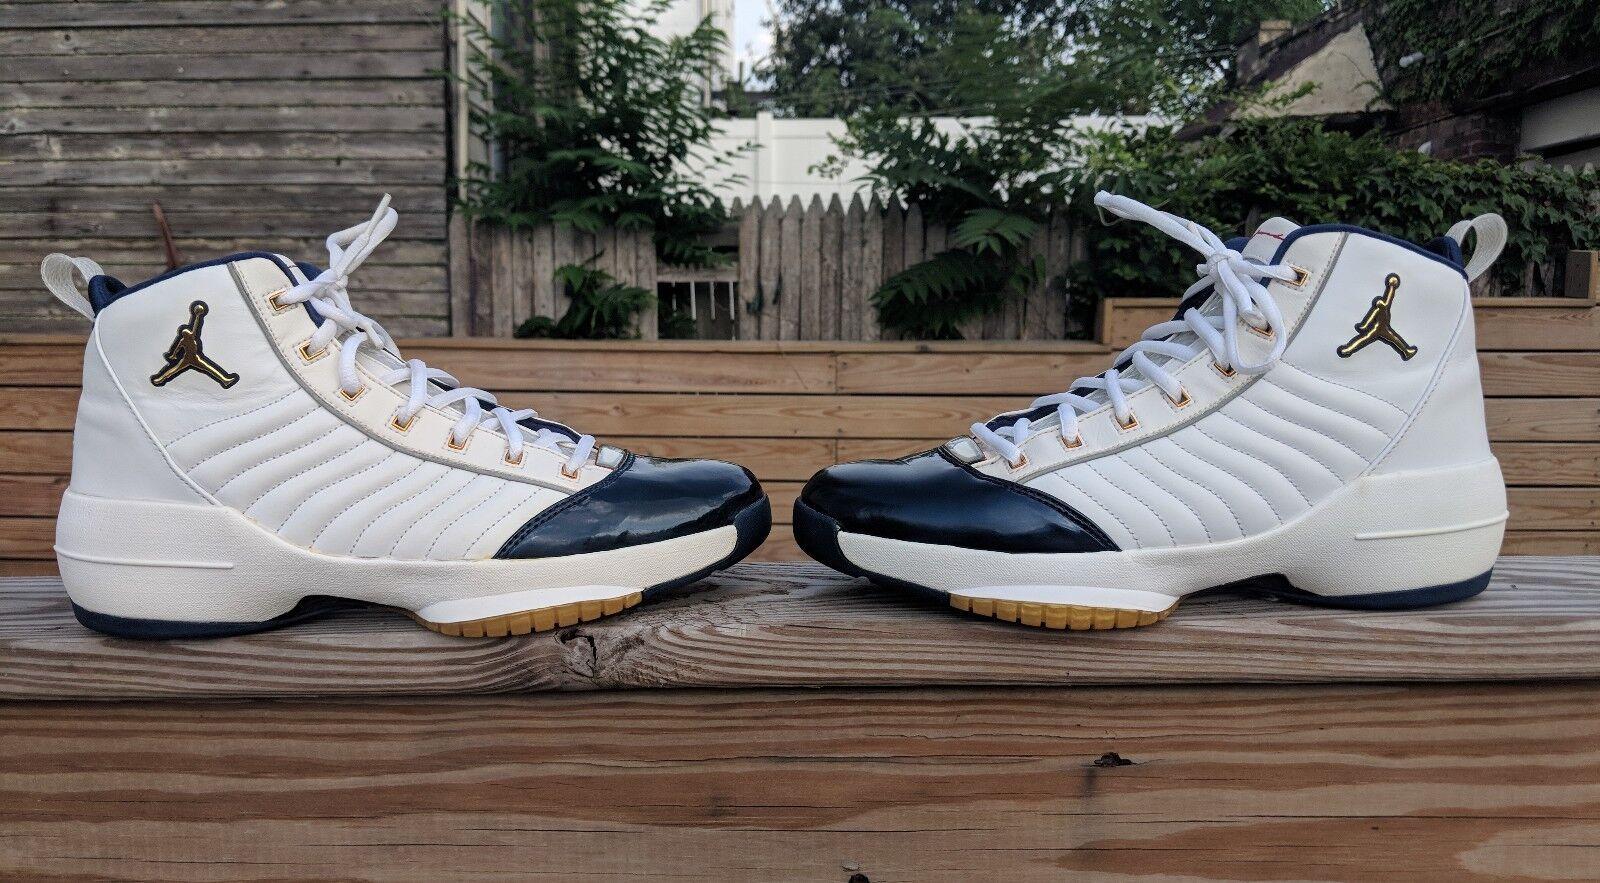 2004 OG Air jordan 19 (XIX) SE Olympic Edition Size 10.5